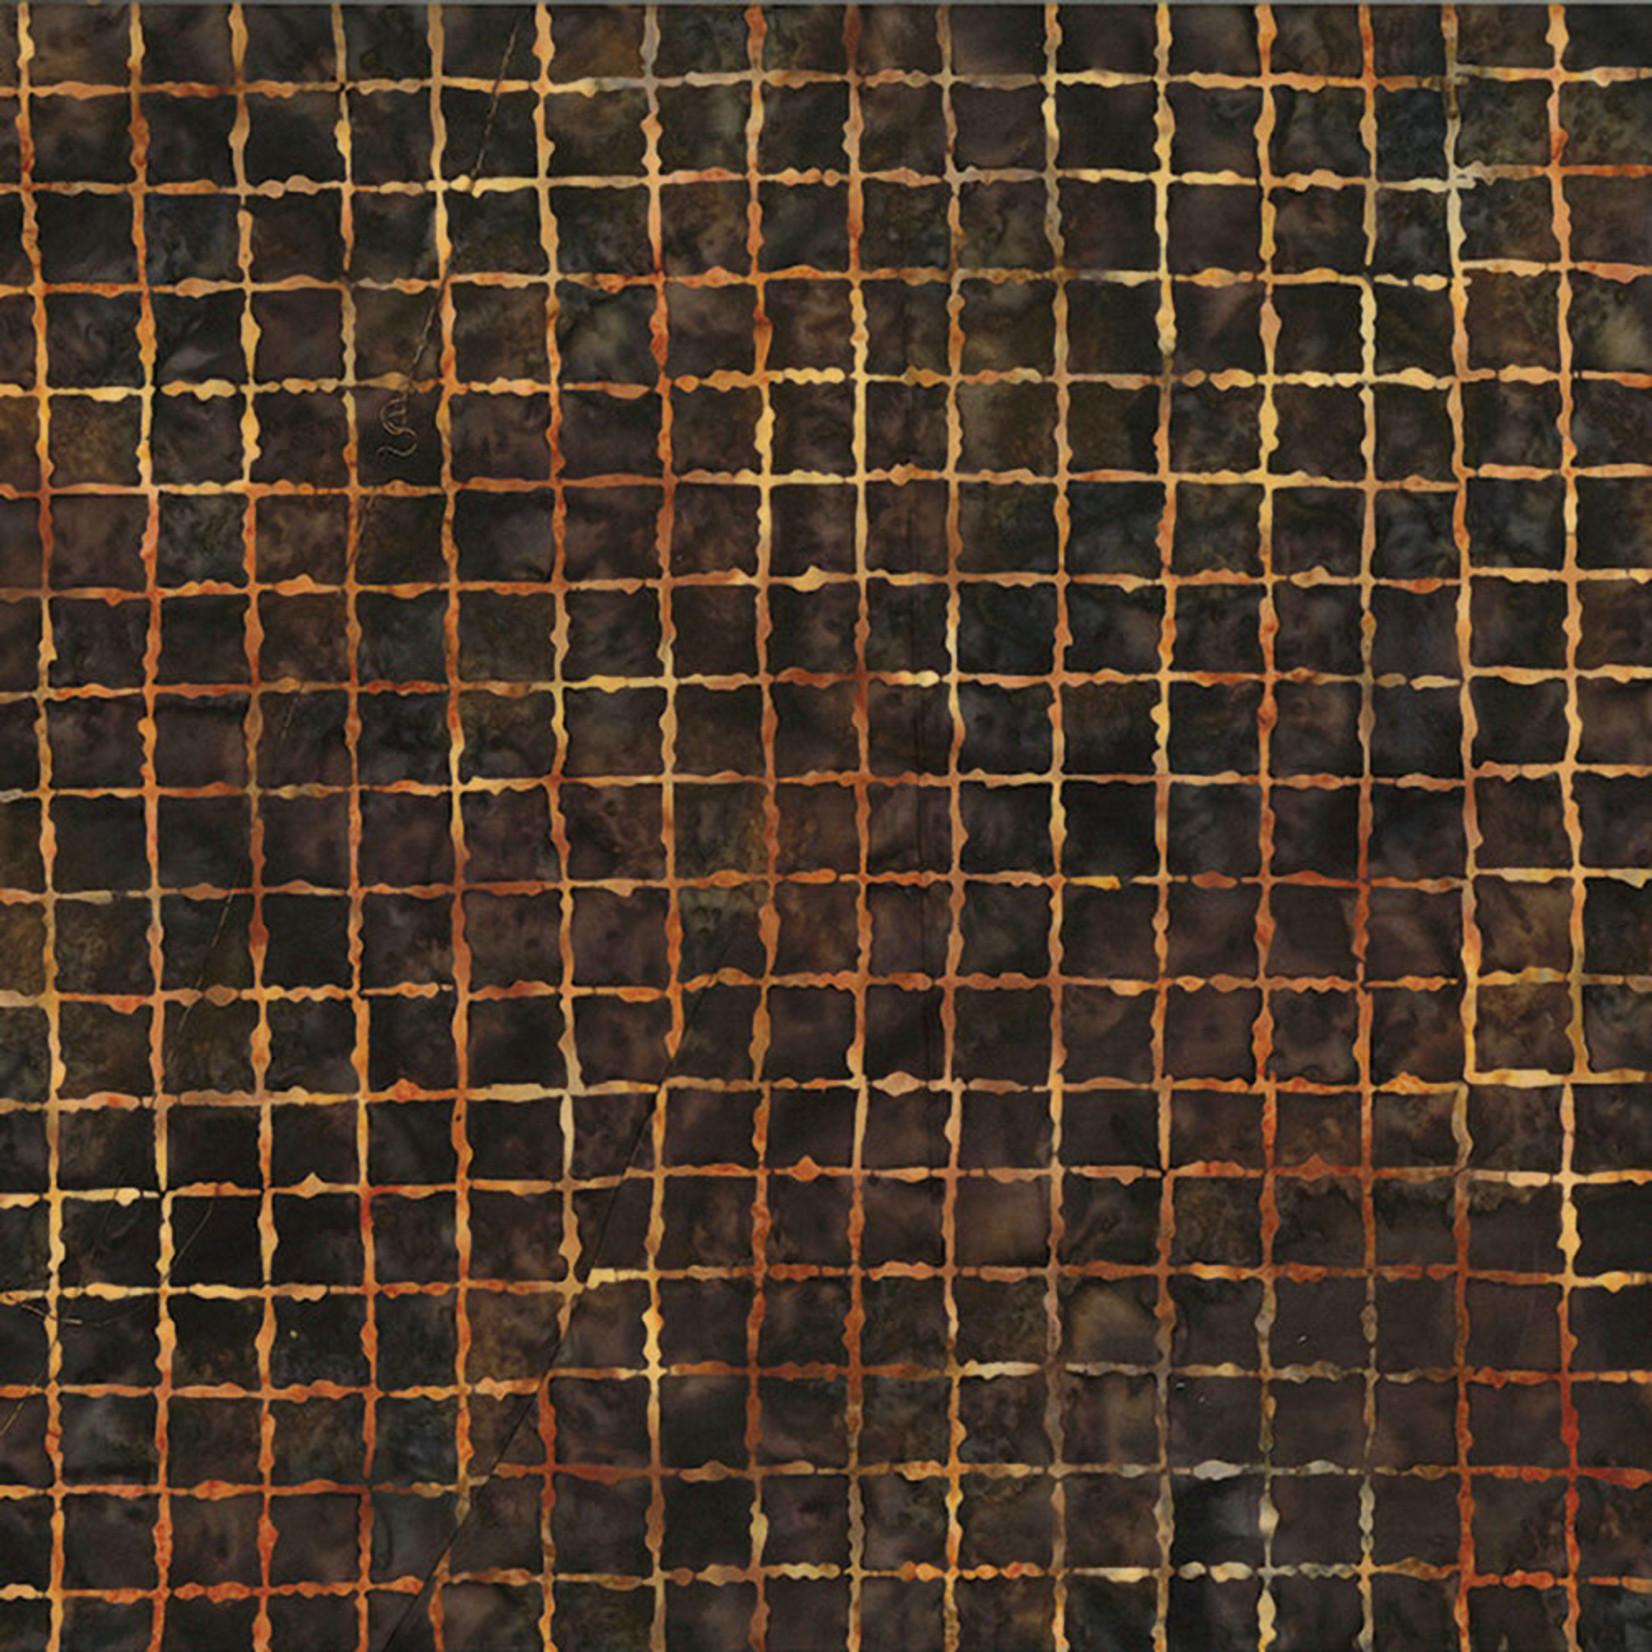 Hoffman Fabrics Bali Batik Grid 2195 - 180 Walnut